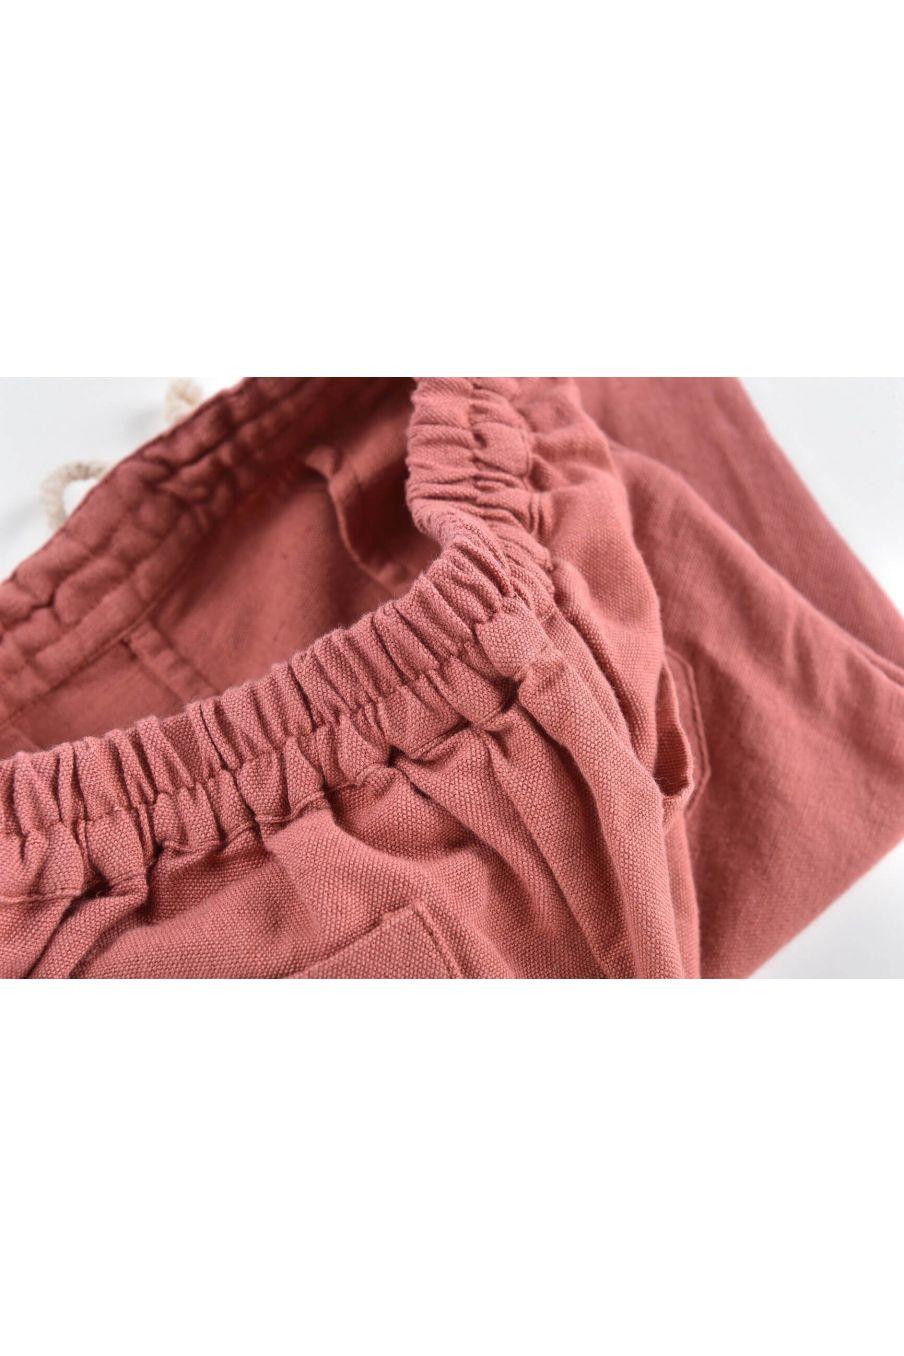 boheme chic vintage pantalon bébé garcon acilu terracota